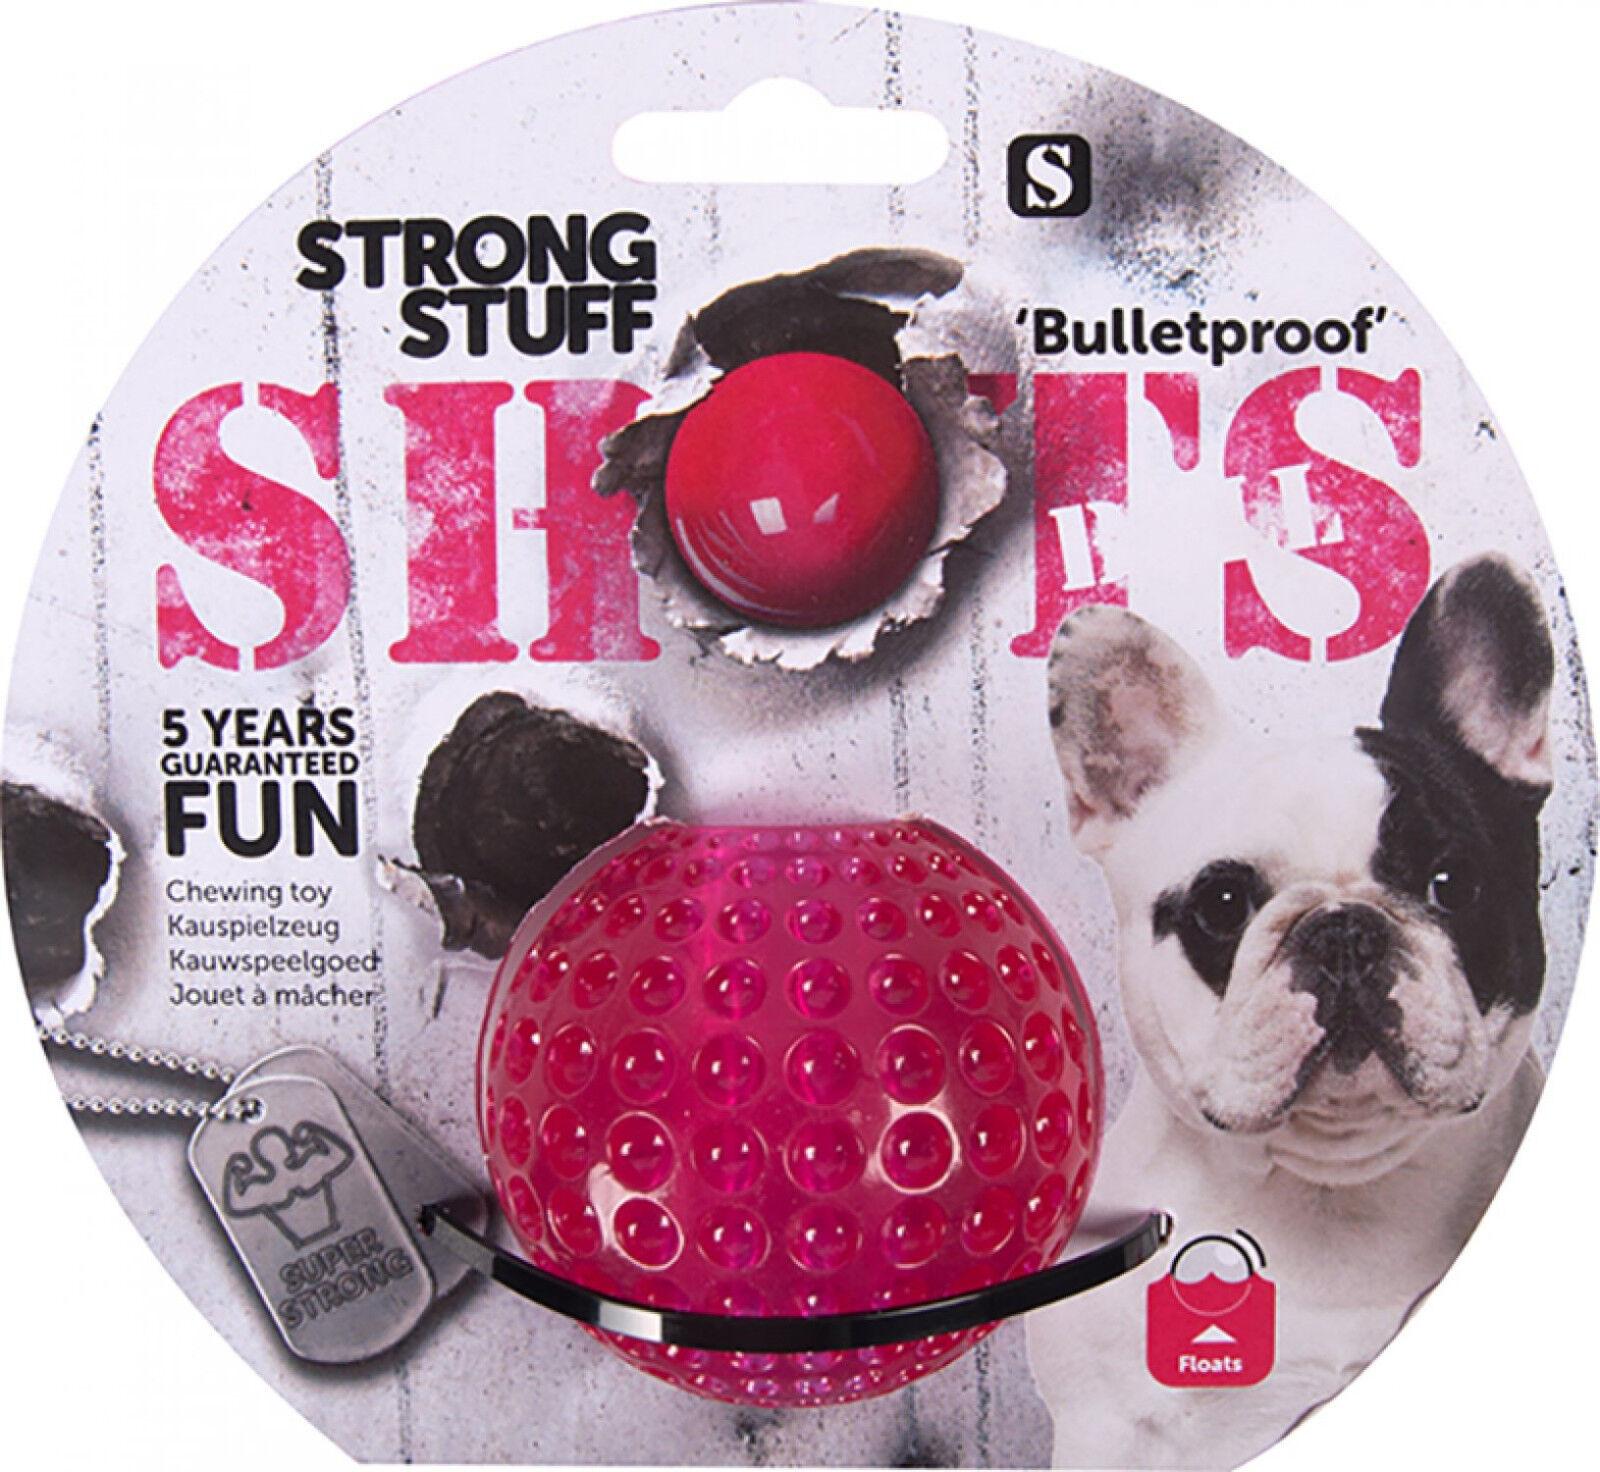 Strong Stuff Shots Bulletproof Virtually Indestructible Tough Dog Toys 4 Shapes